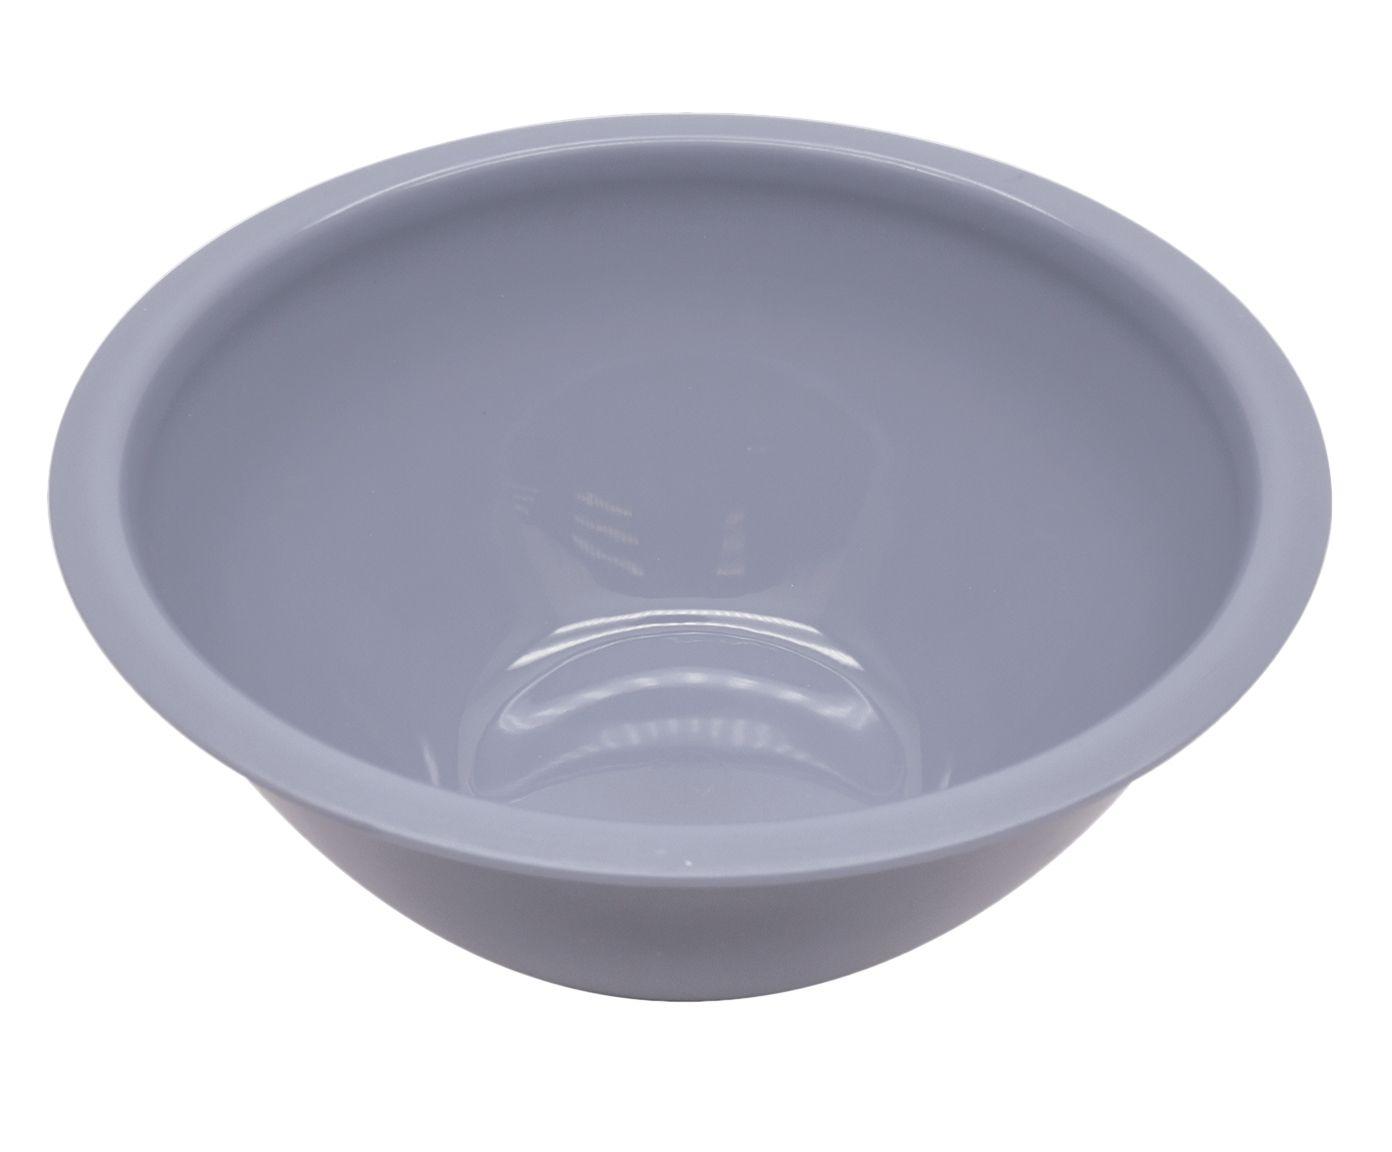 Bowl Elemental Cinza Escuro - 19cm | Westwing.com.br